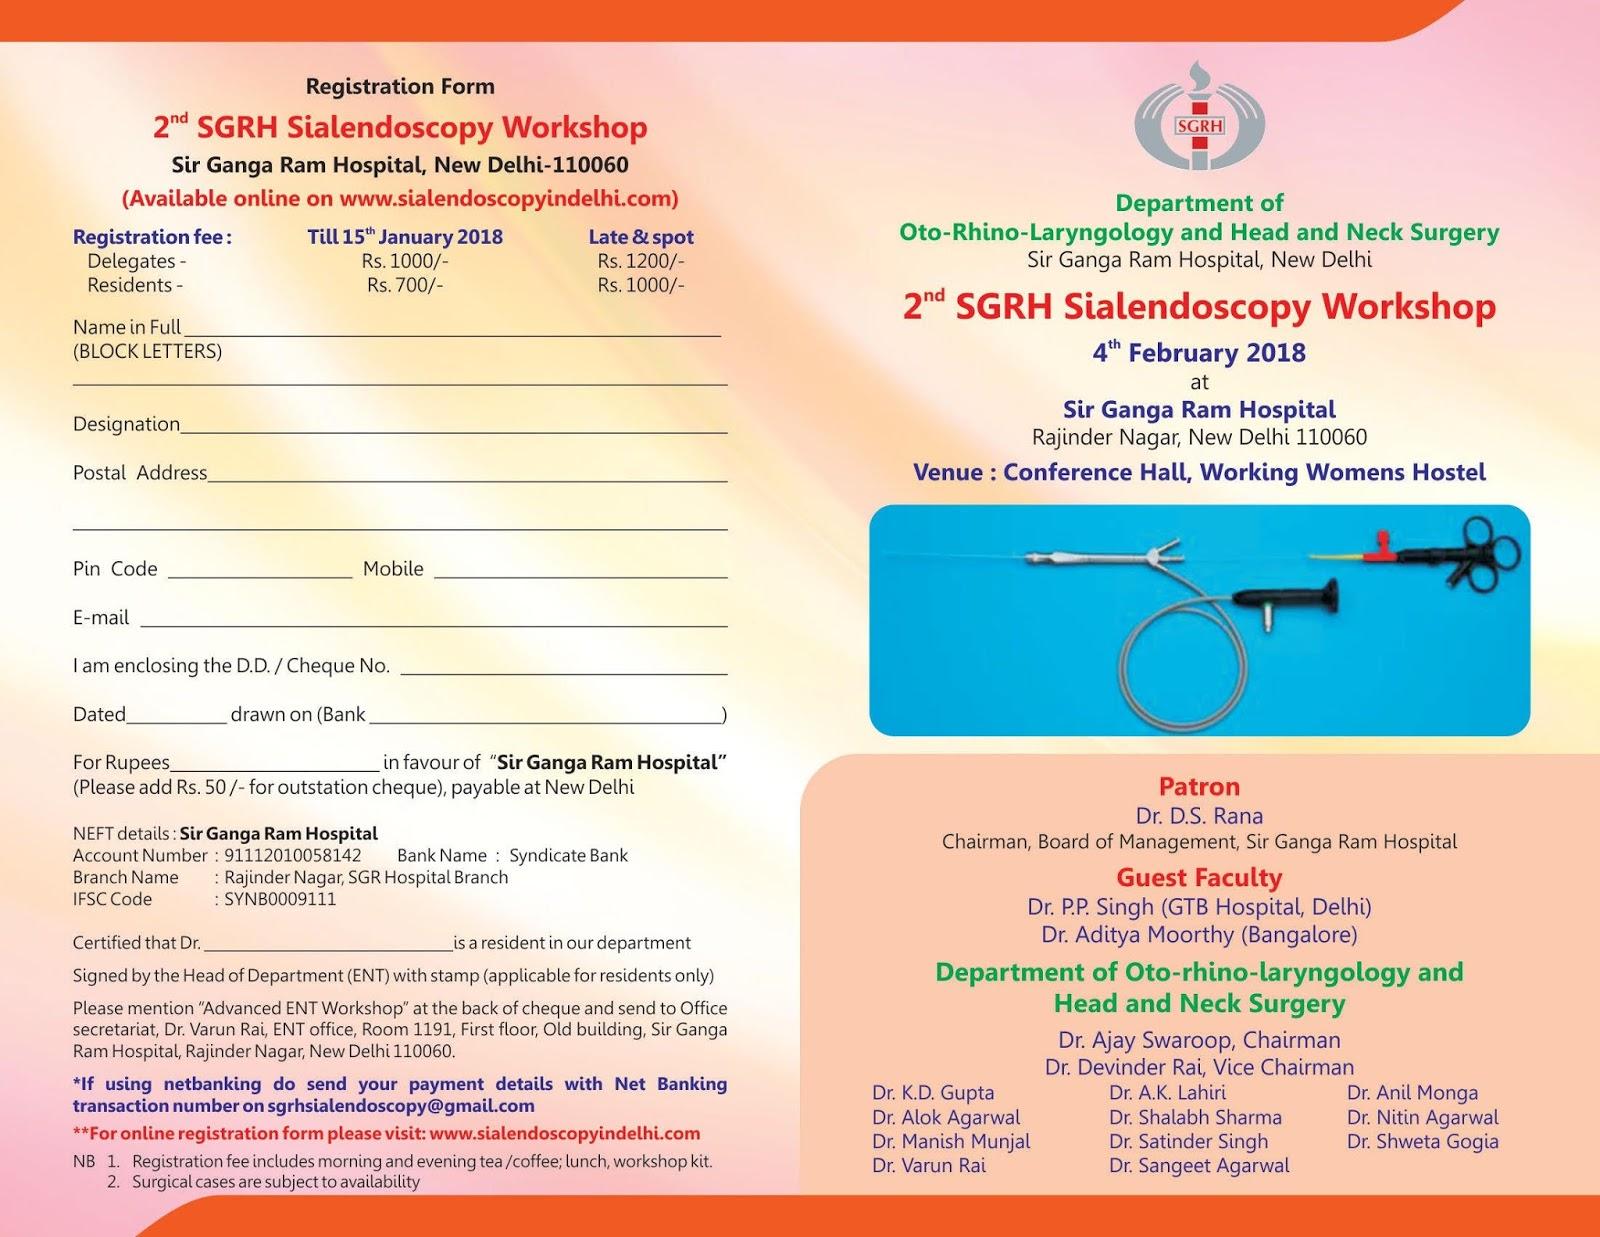 Otolaryngology Update: 2nd SGRM Sialendoscopy Workshop, 4